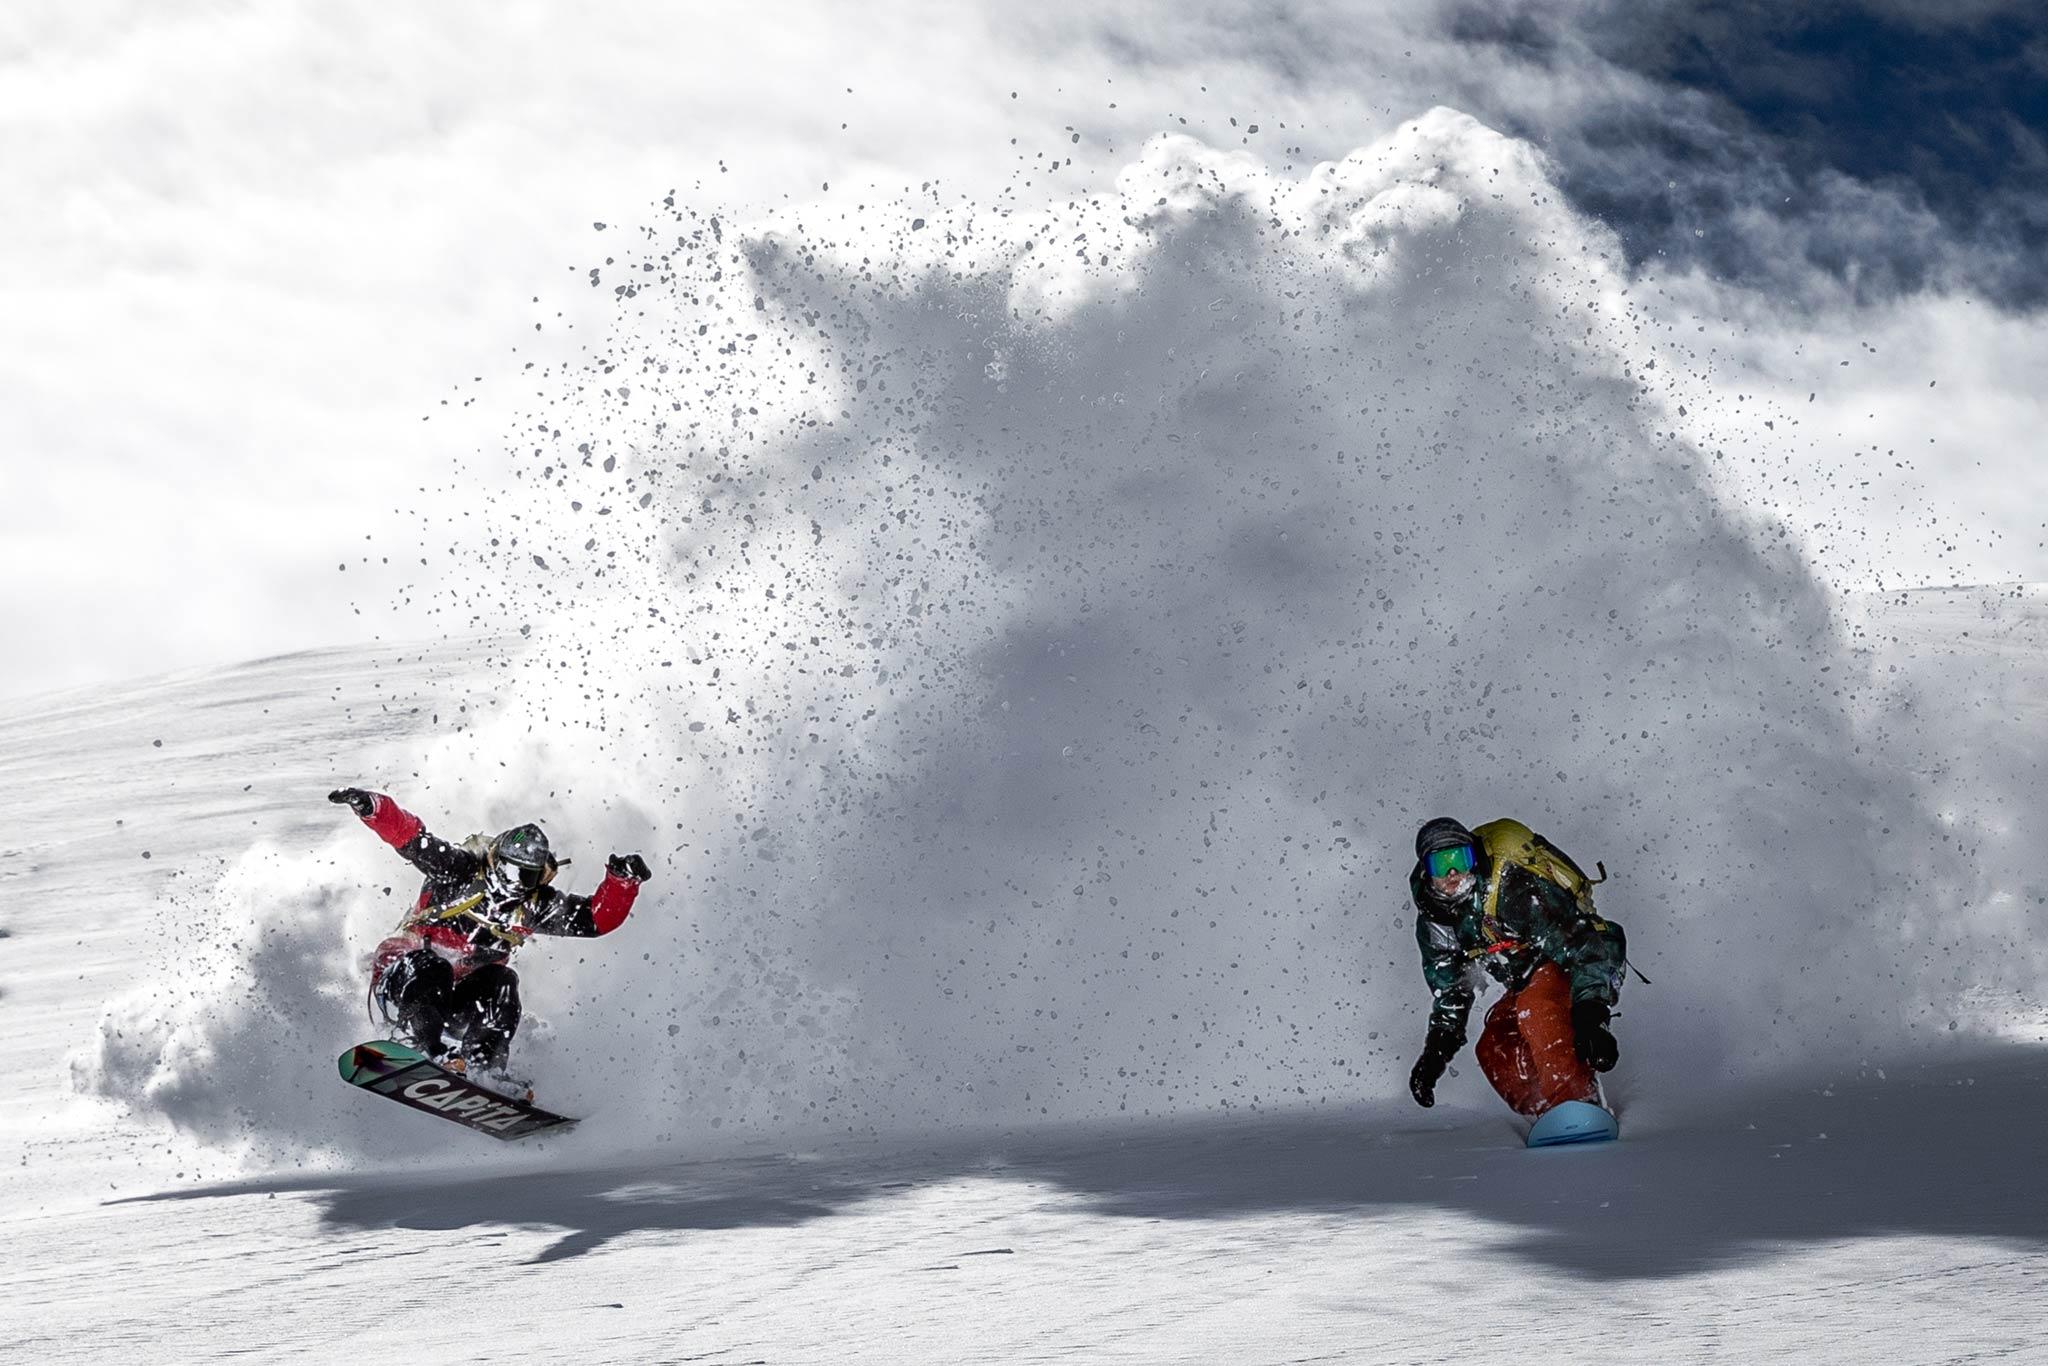 Foto: Roberto Bragotto - Rider: Simon Gruber & Marco Grigis